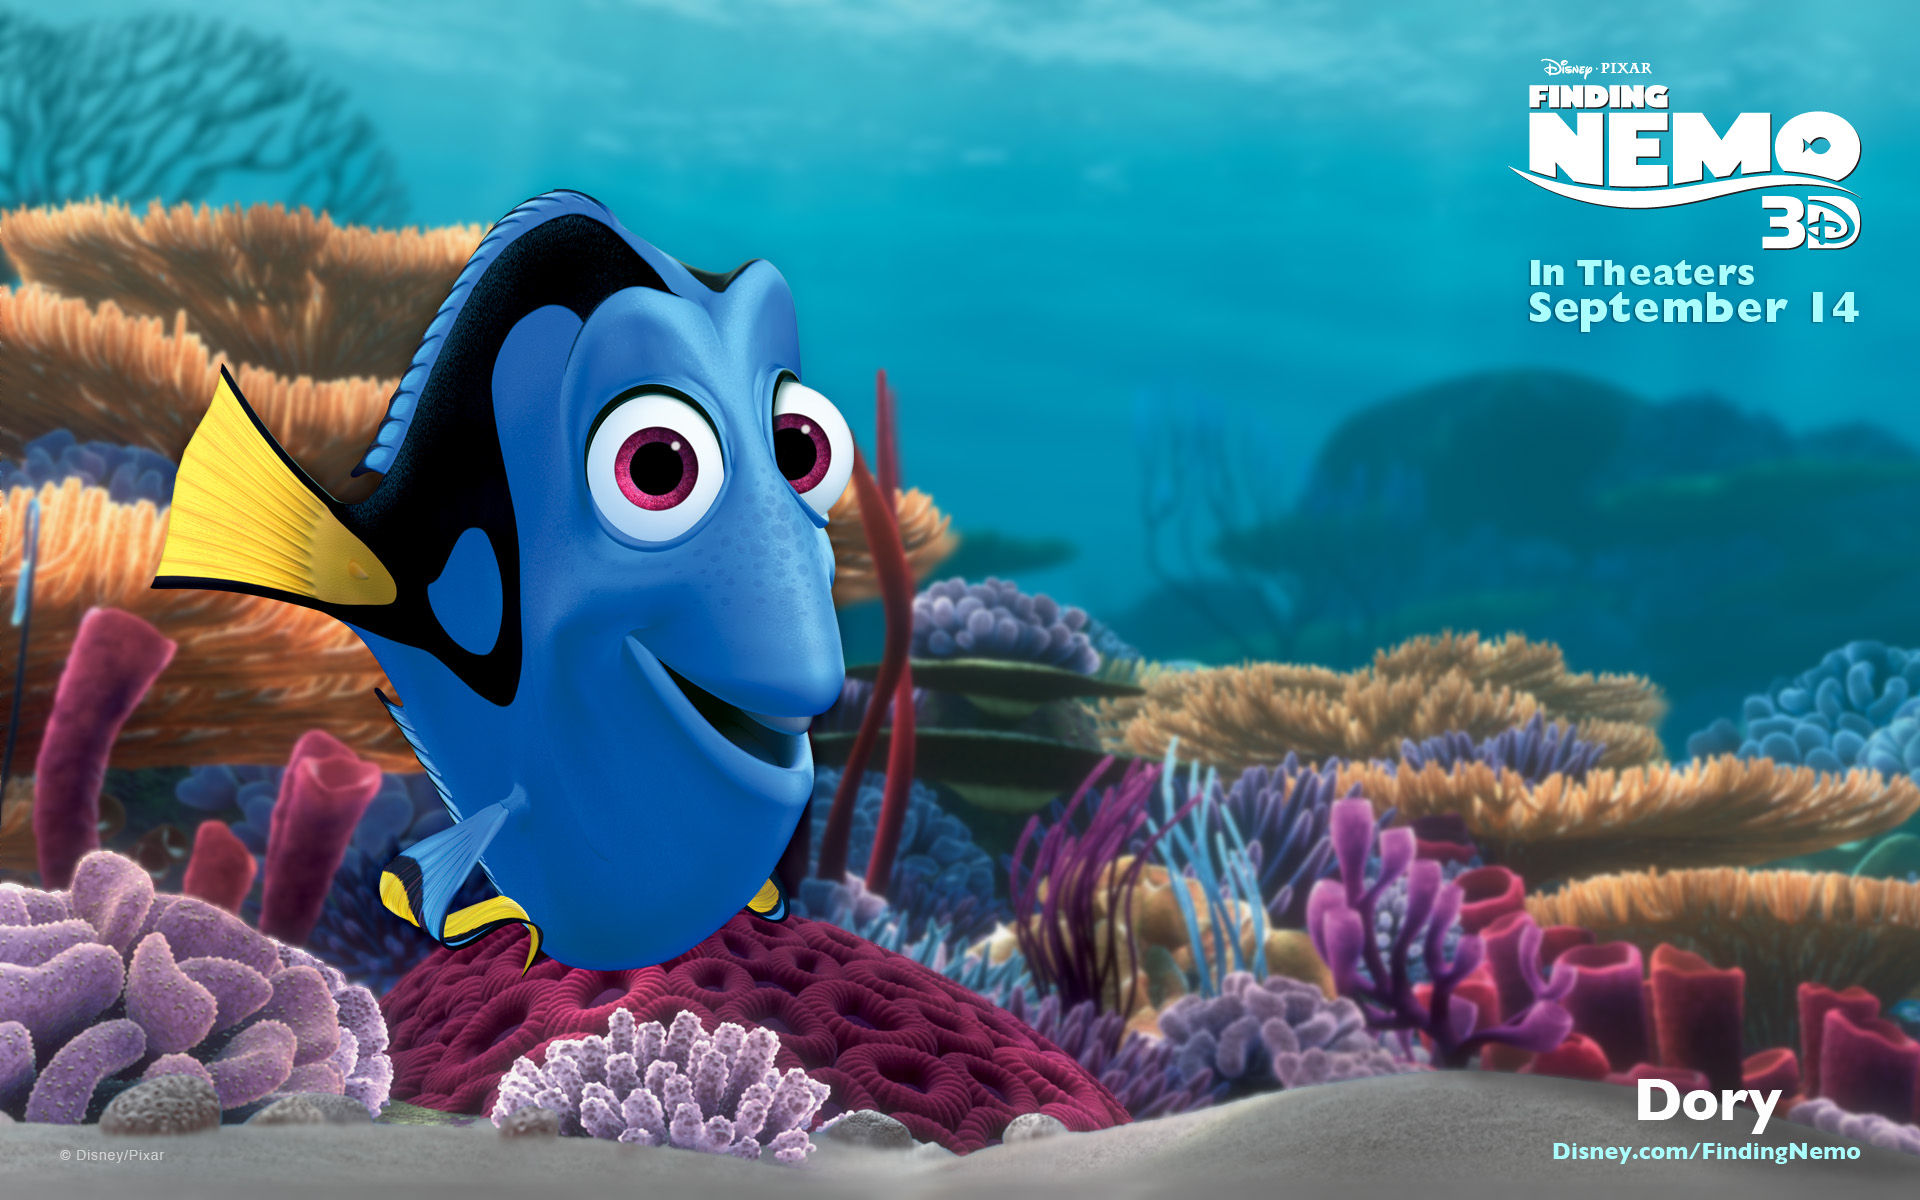 dory-fish-nhan-vat-chinh-trong-phan-tiep-theo-cua-finding-nemo